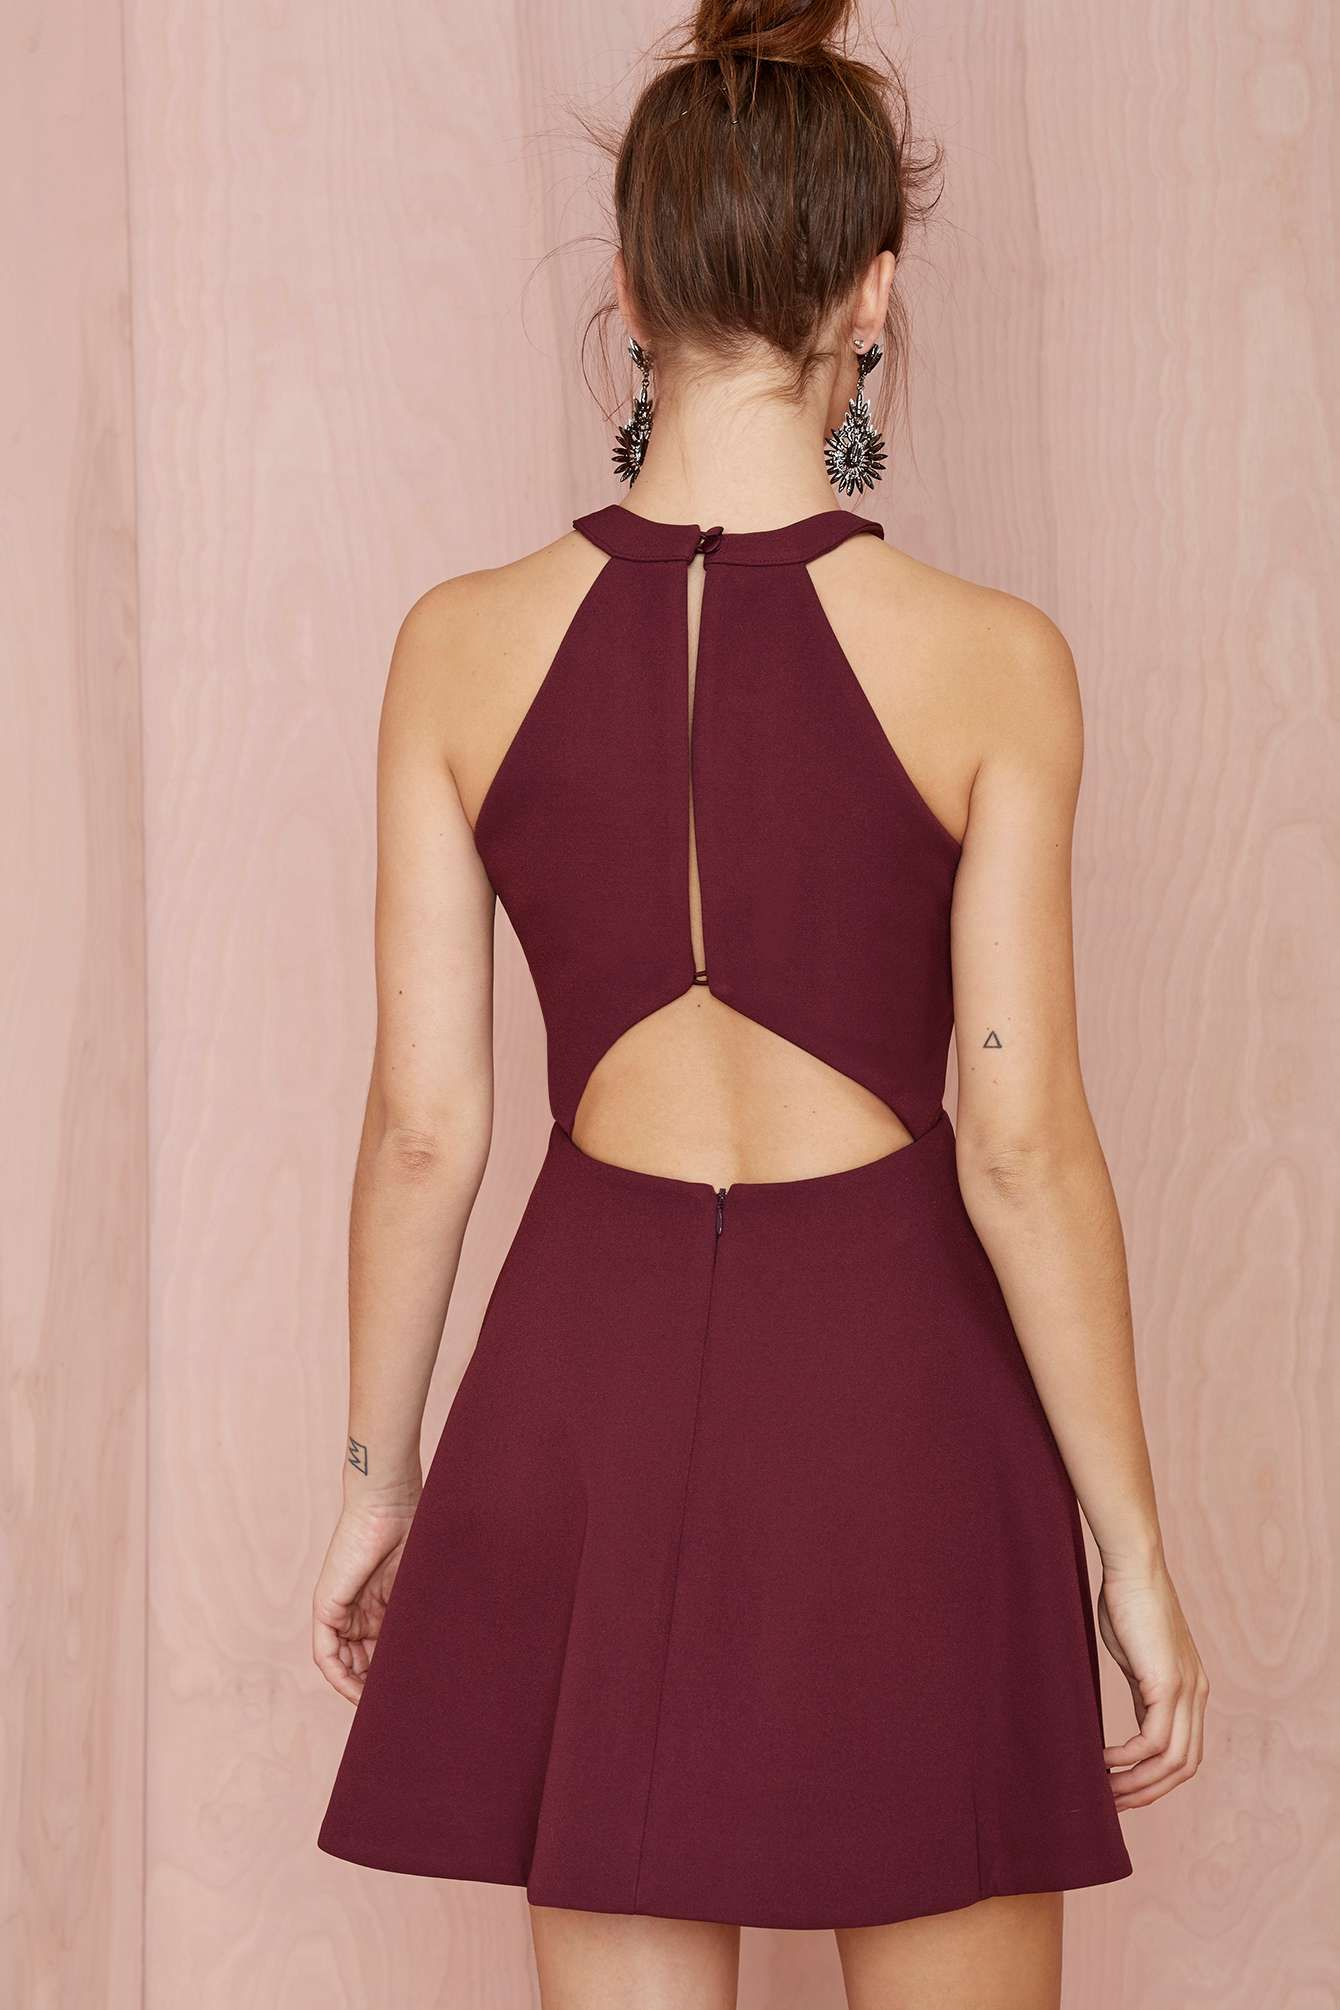 Keepsake Adore You Cutaway Dress Sports Banquet Dresses Party Dresses Short Cocktail Burgundy Party Dress Short